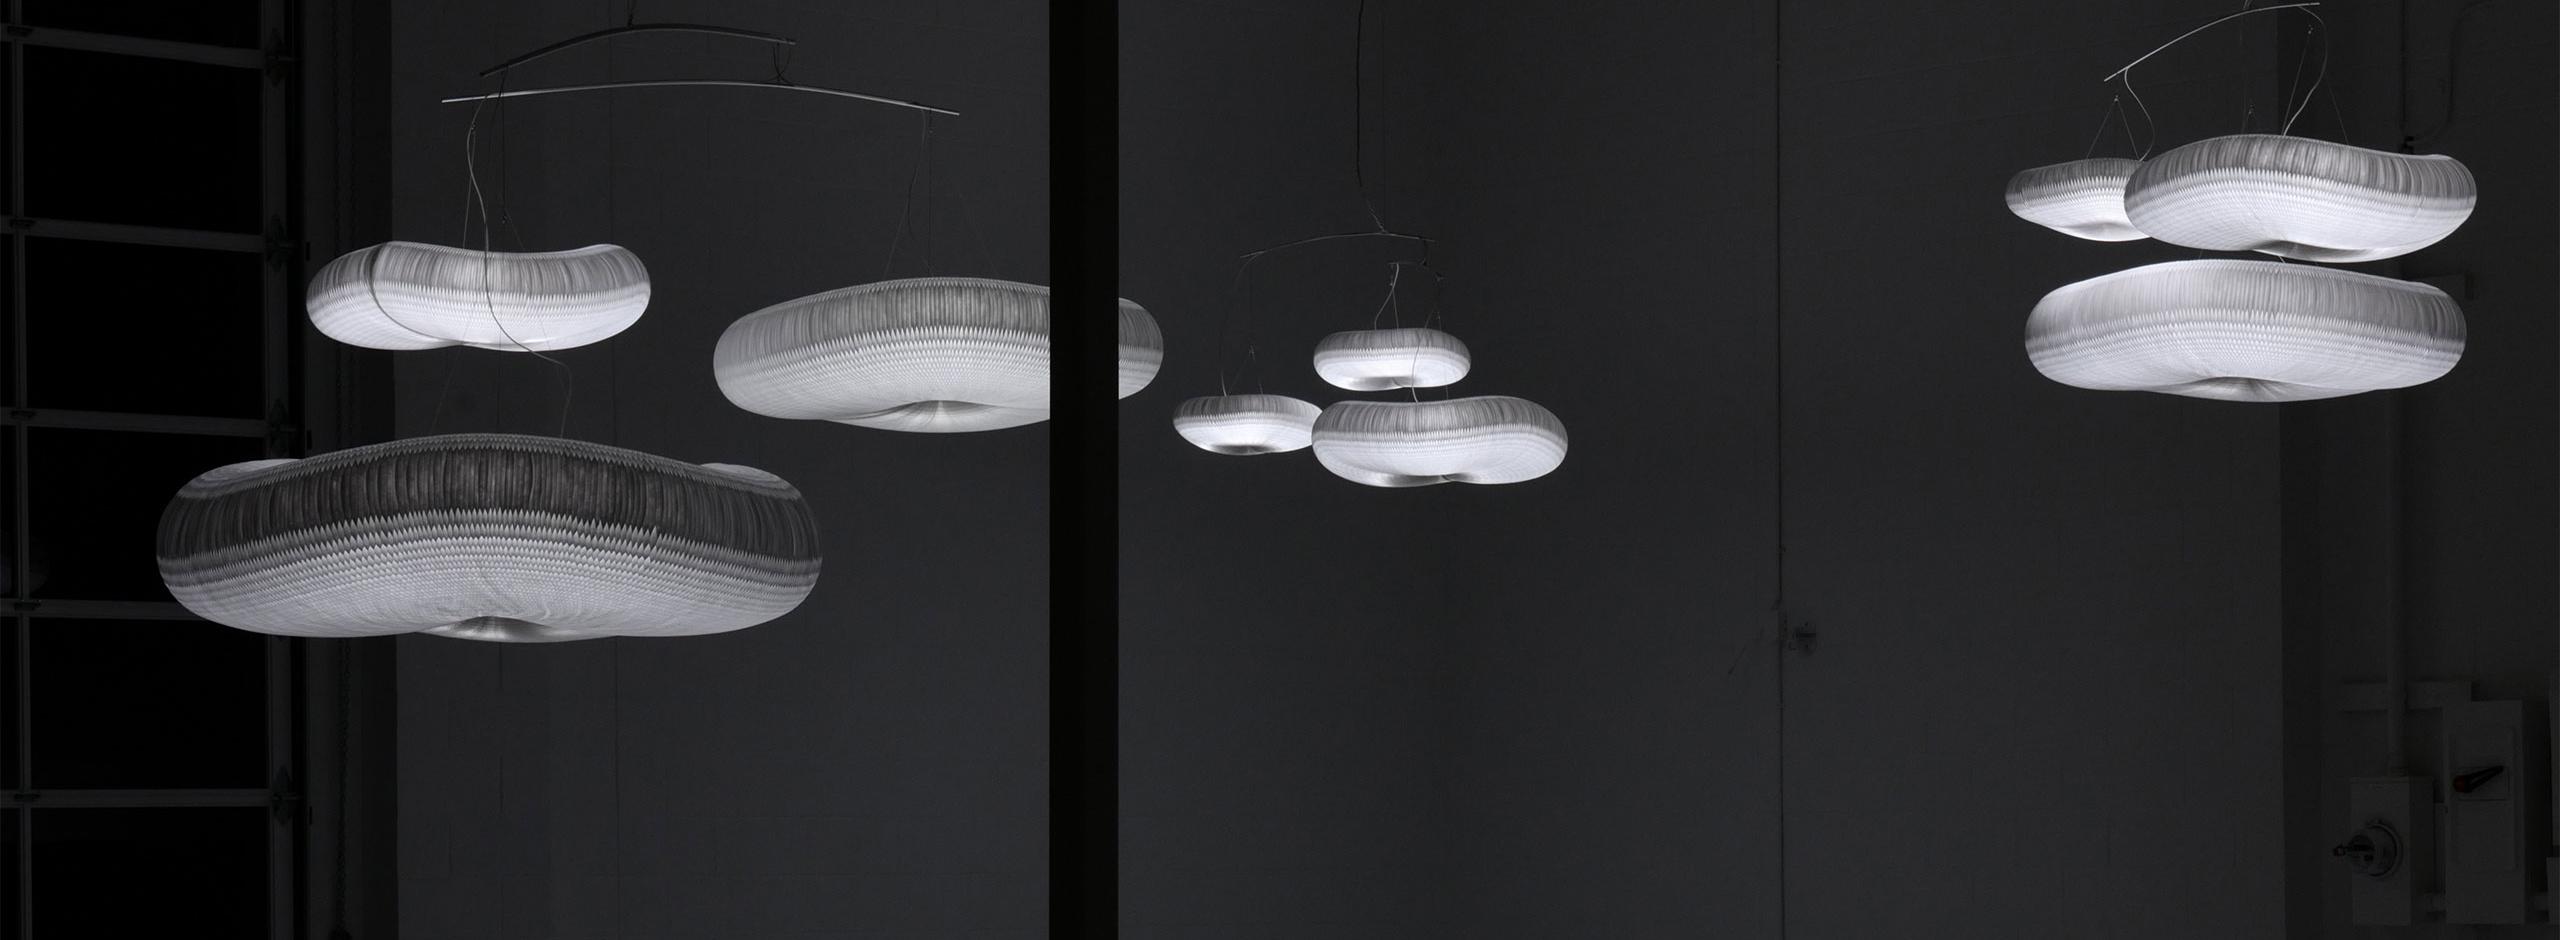 three cloud mobiles hang in the dark